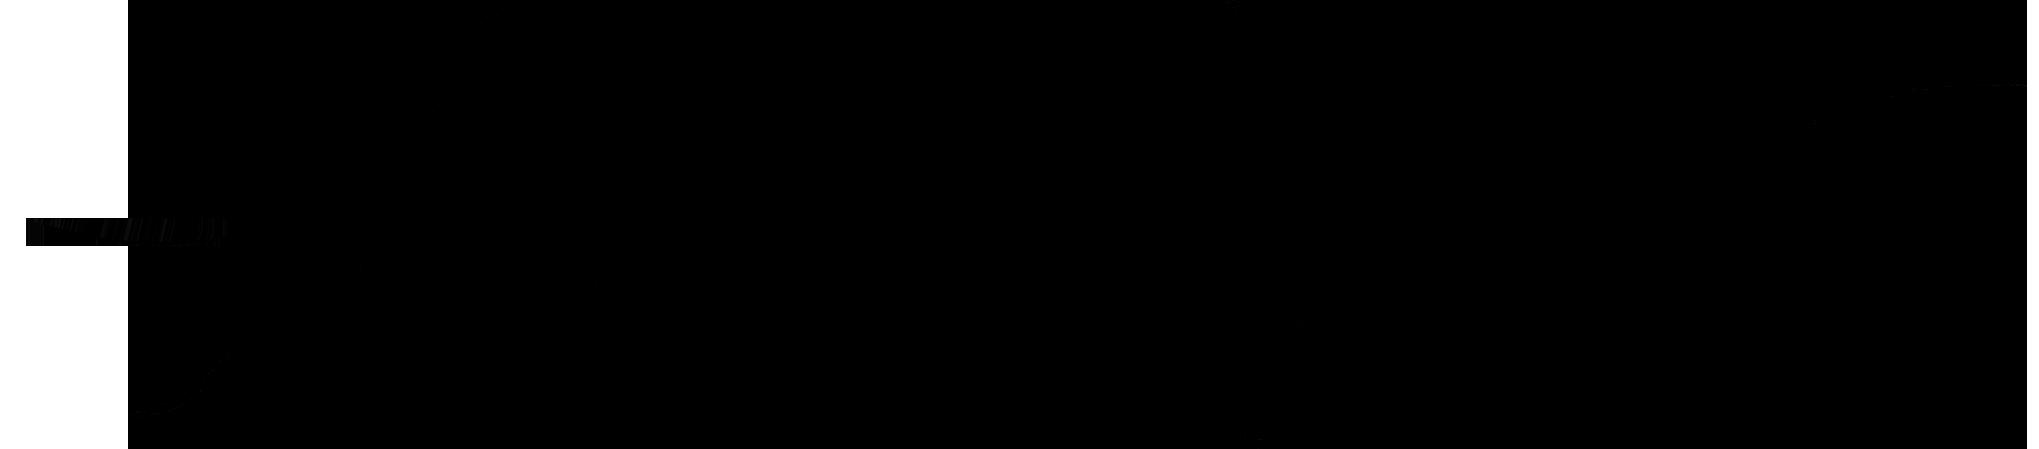 KendraHarper_Logo.png